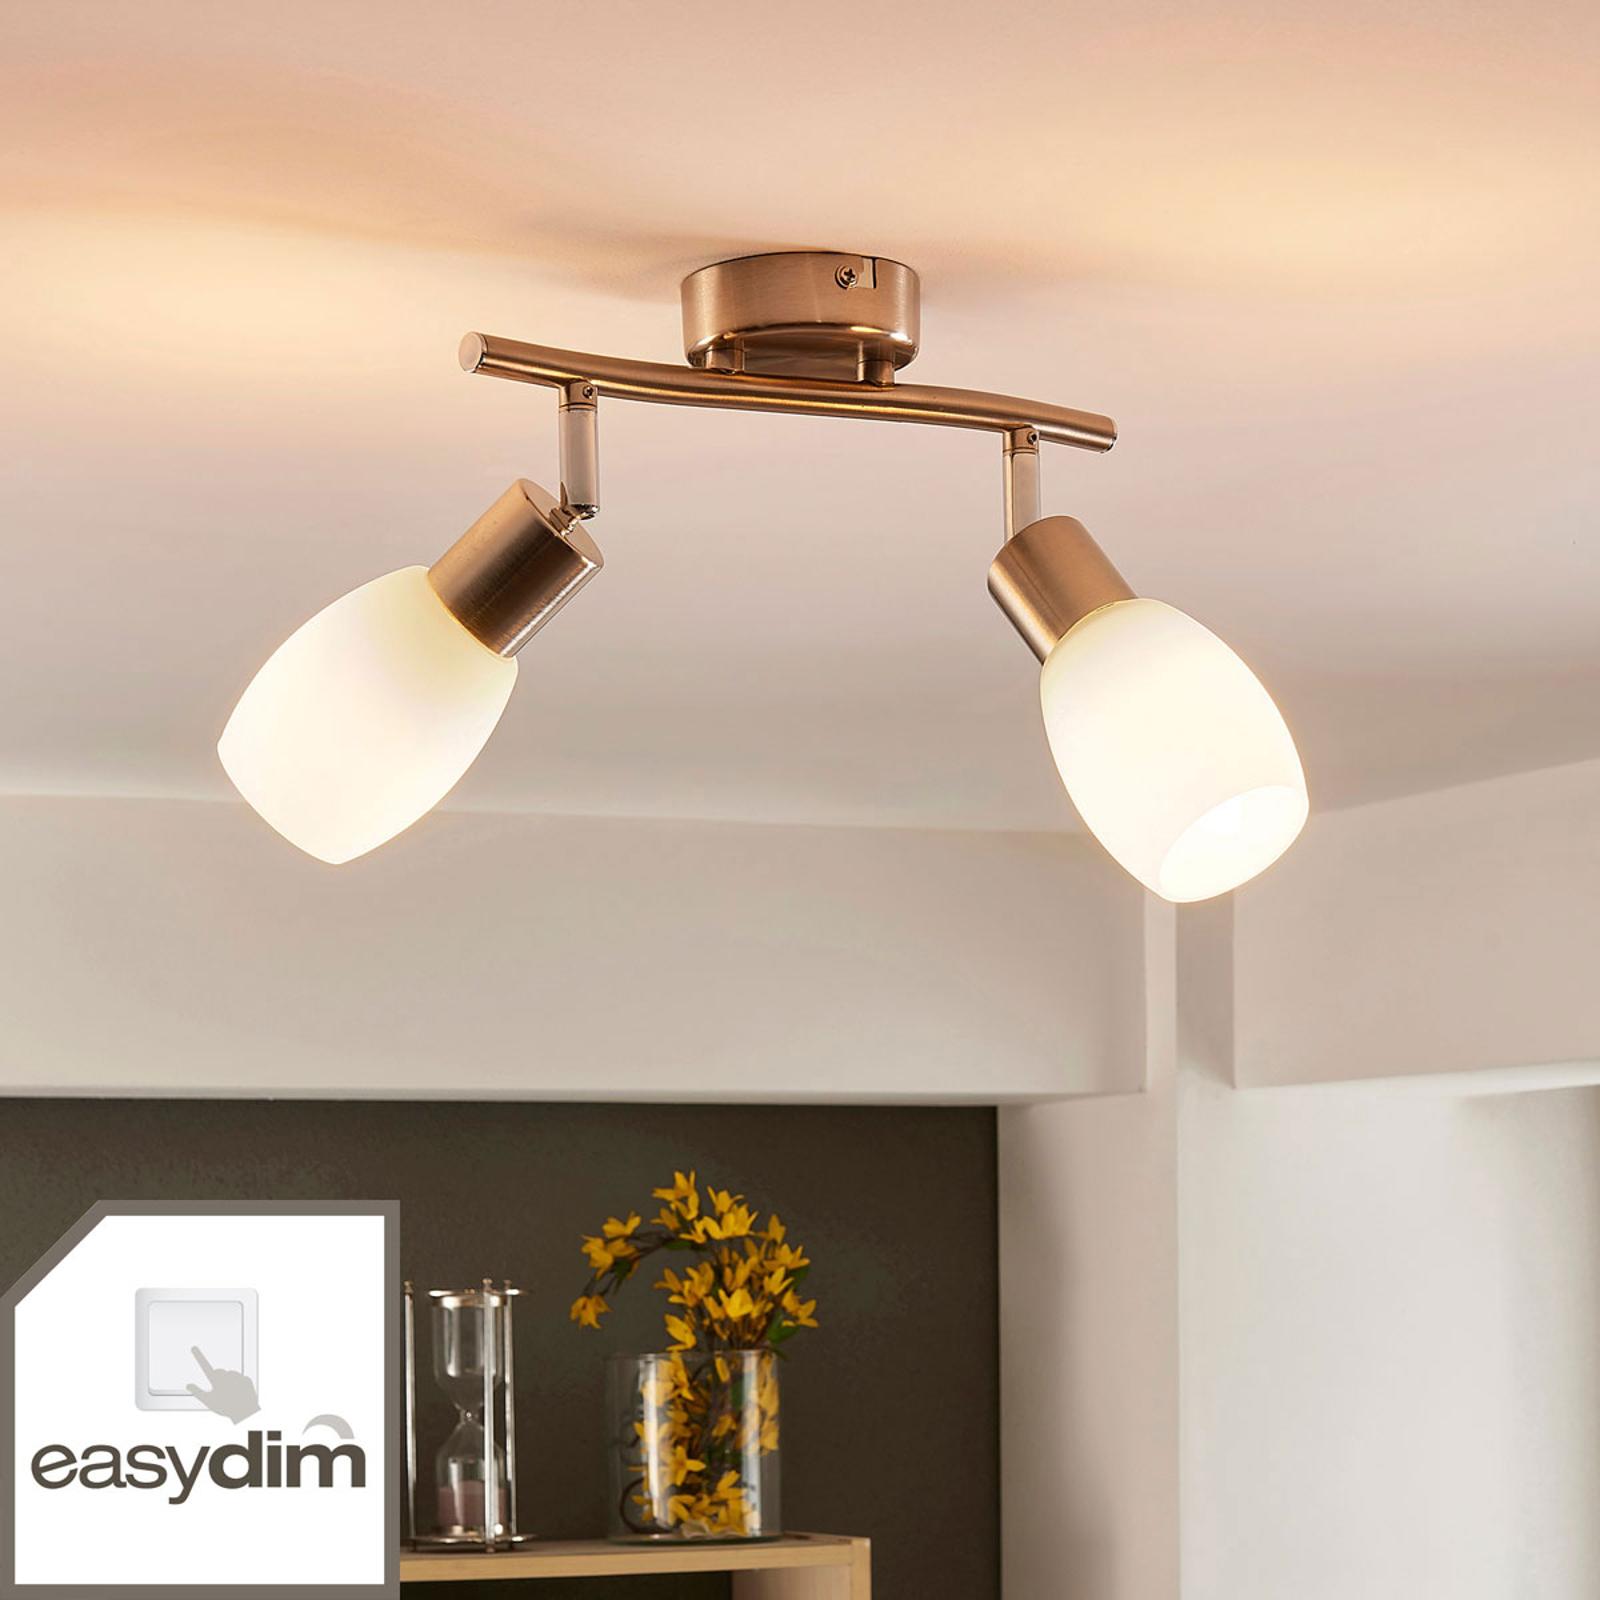 Reflektor LED Arda na ścianę i sufit, easydim